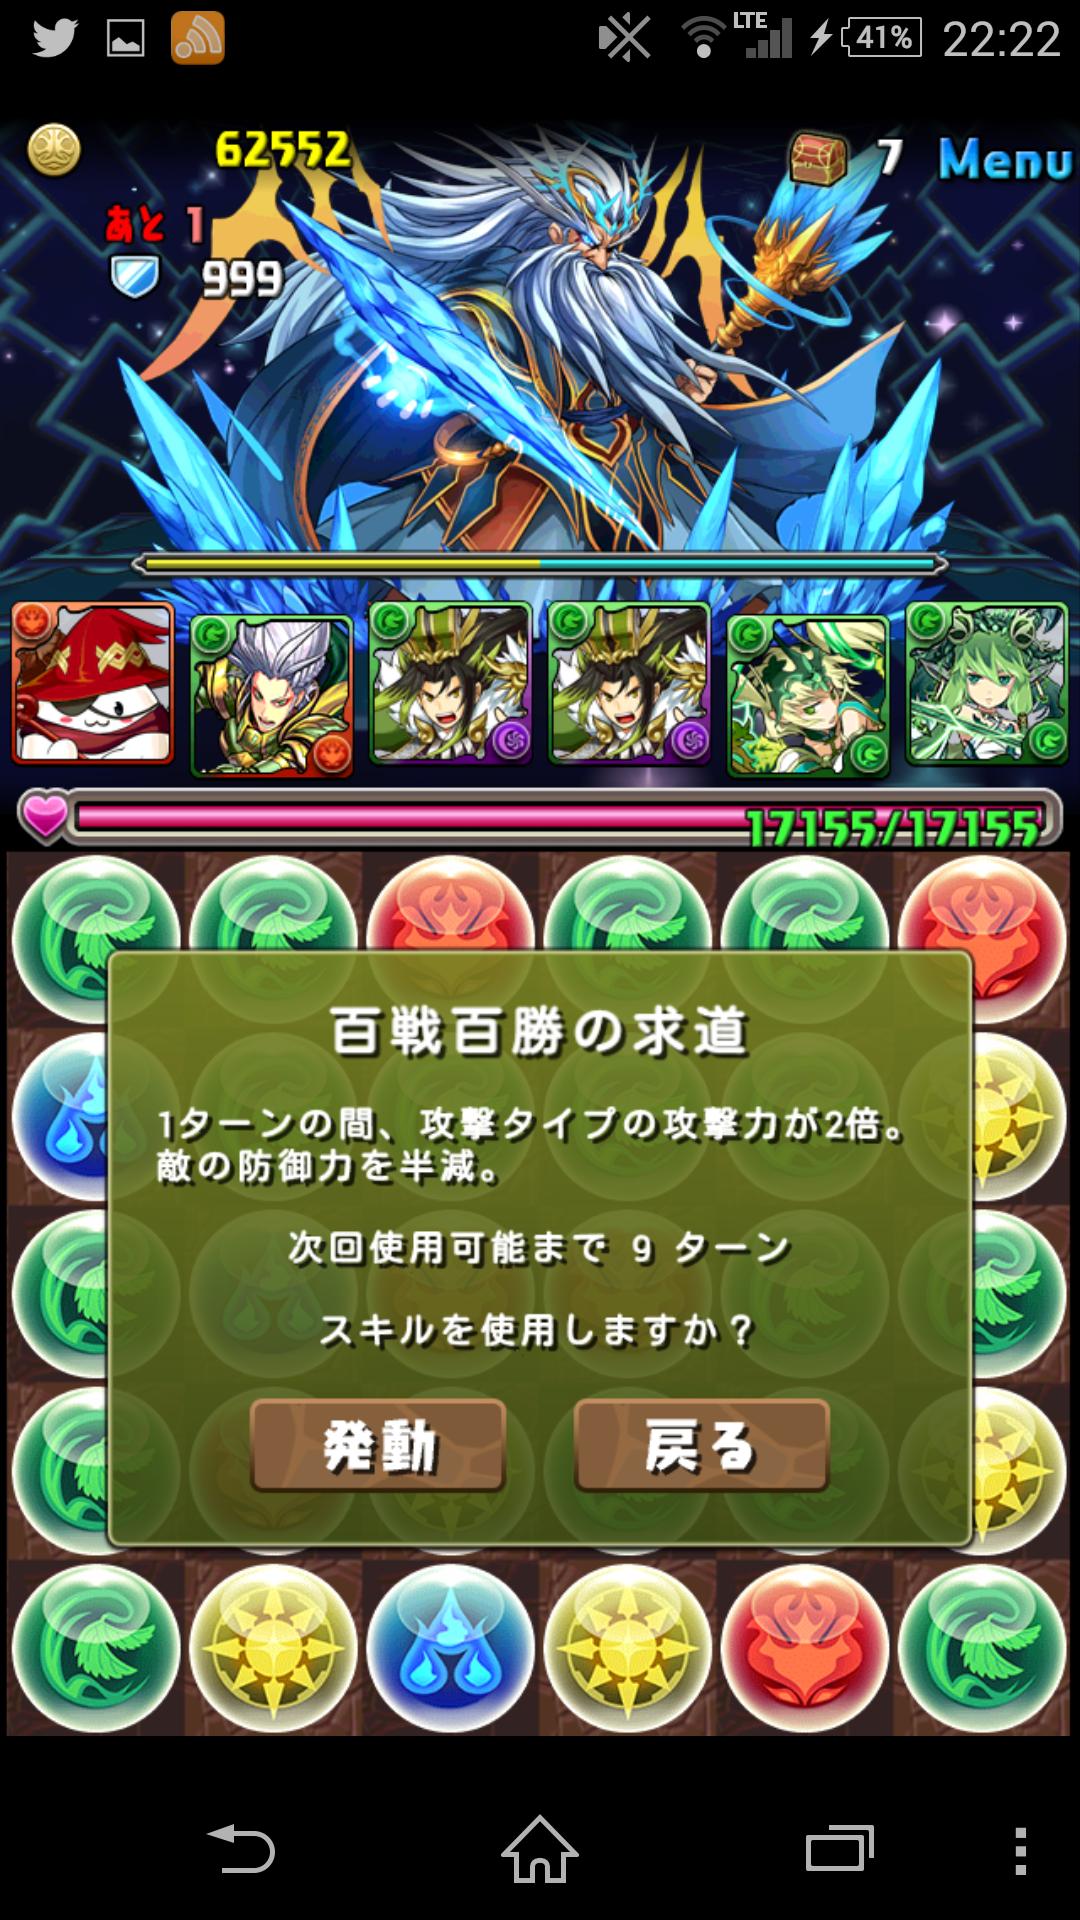 Screenshot_2015-02-20-22-22-32.png